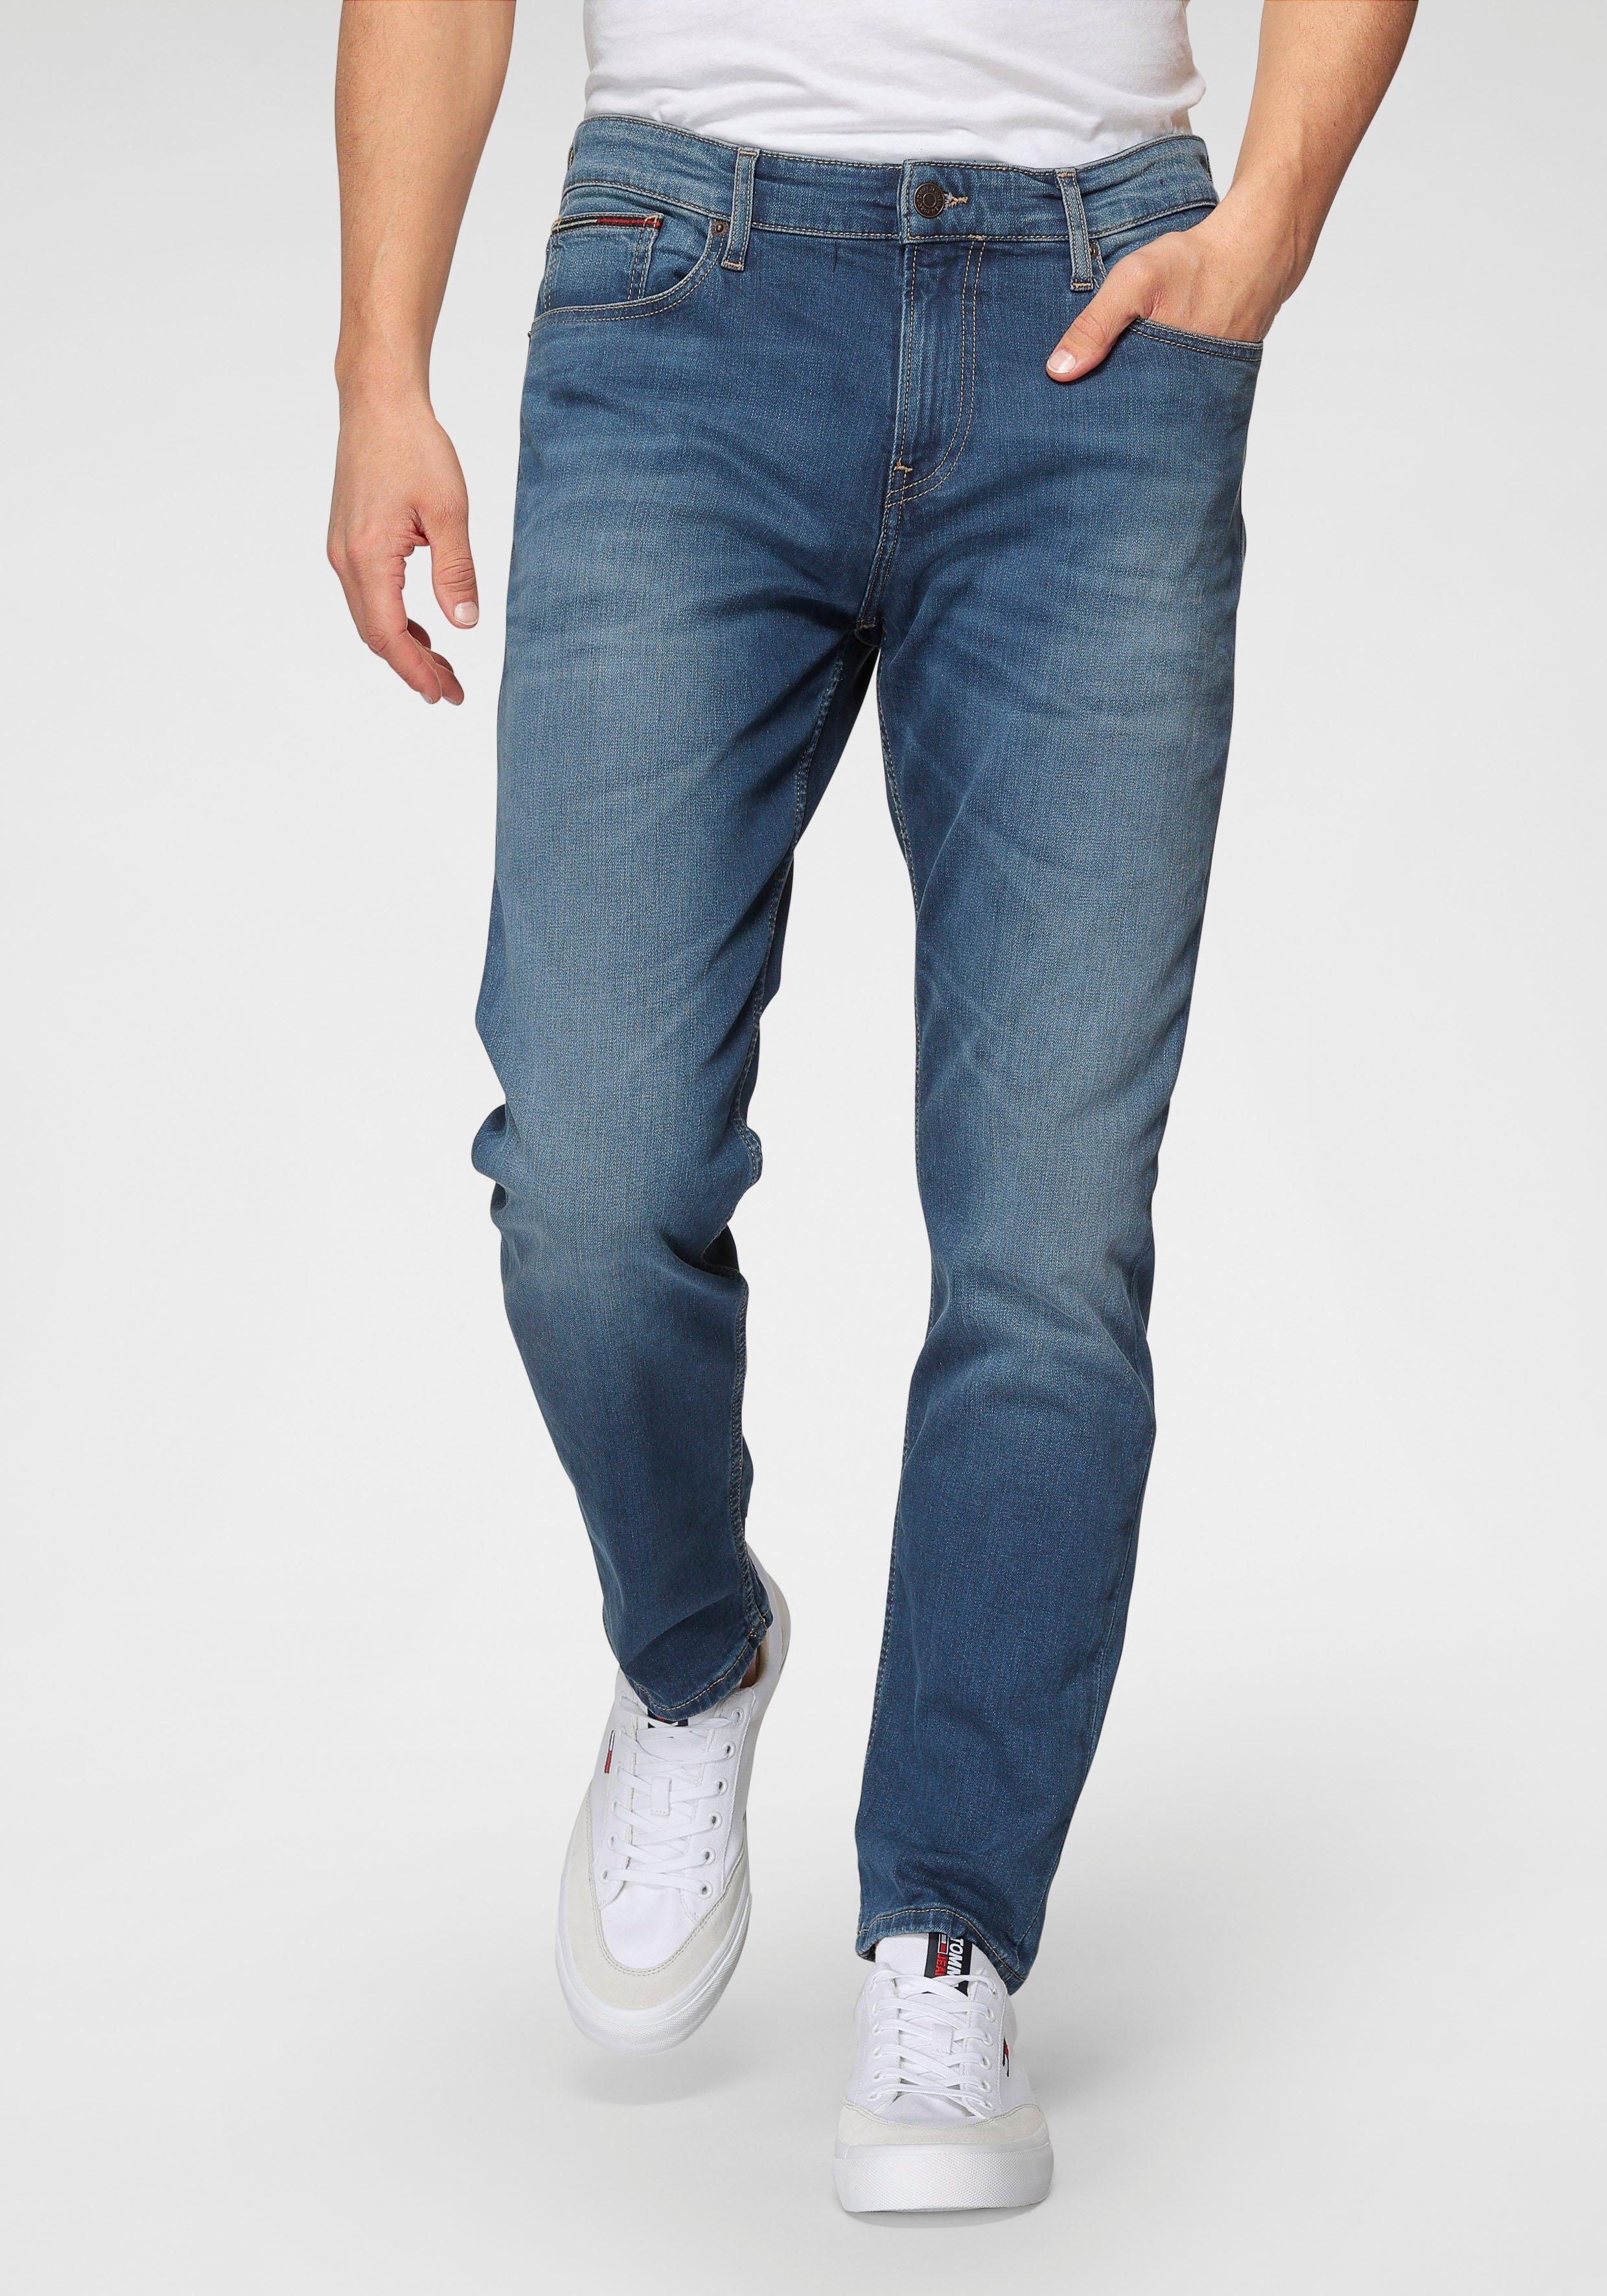 TOMMY JEANS straight jeans »ORIGINAL STRAIGHT RYAN« voordelig en veilig online kopen